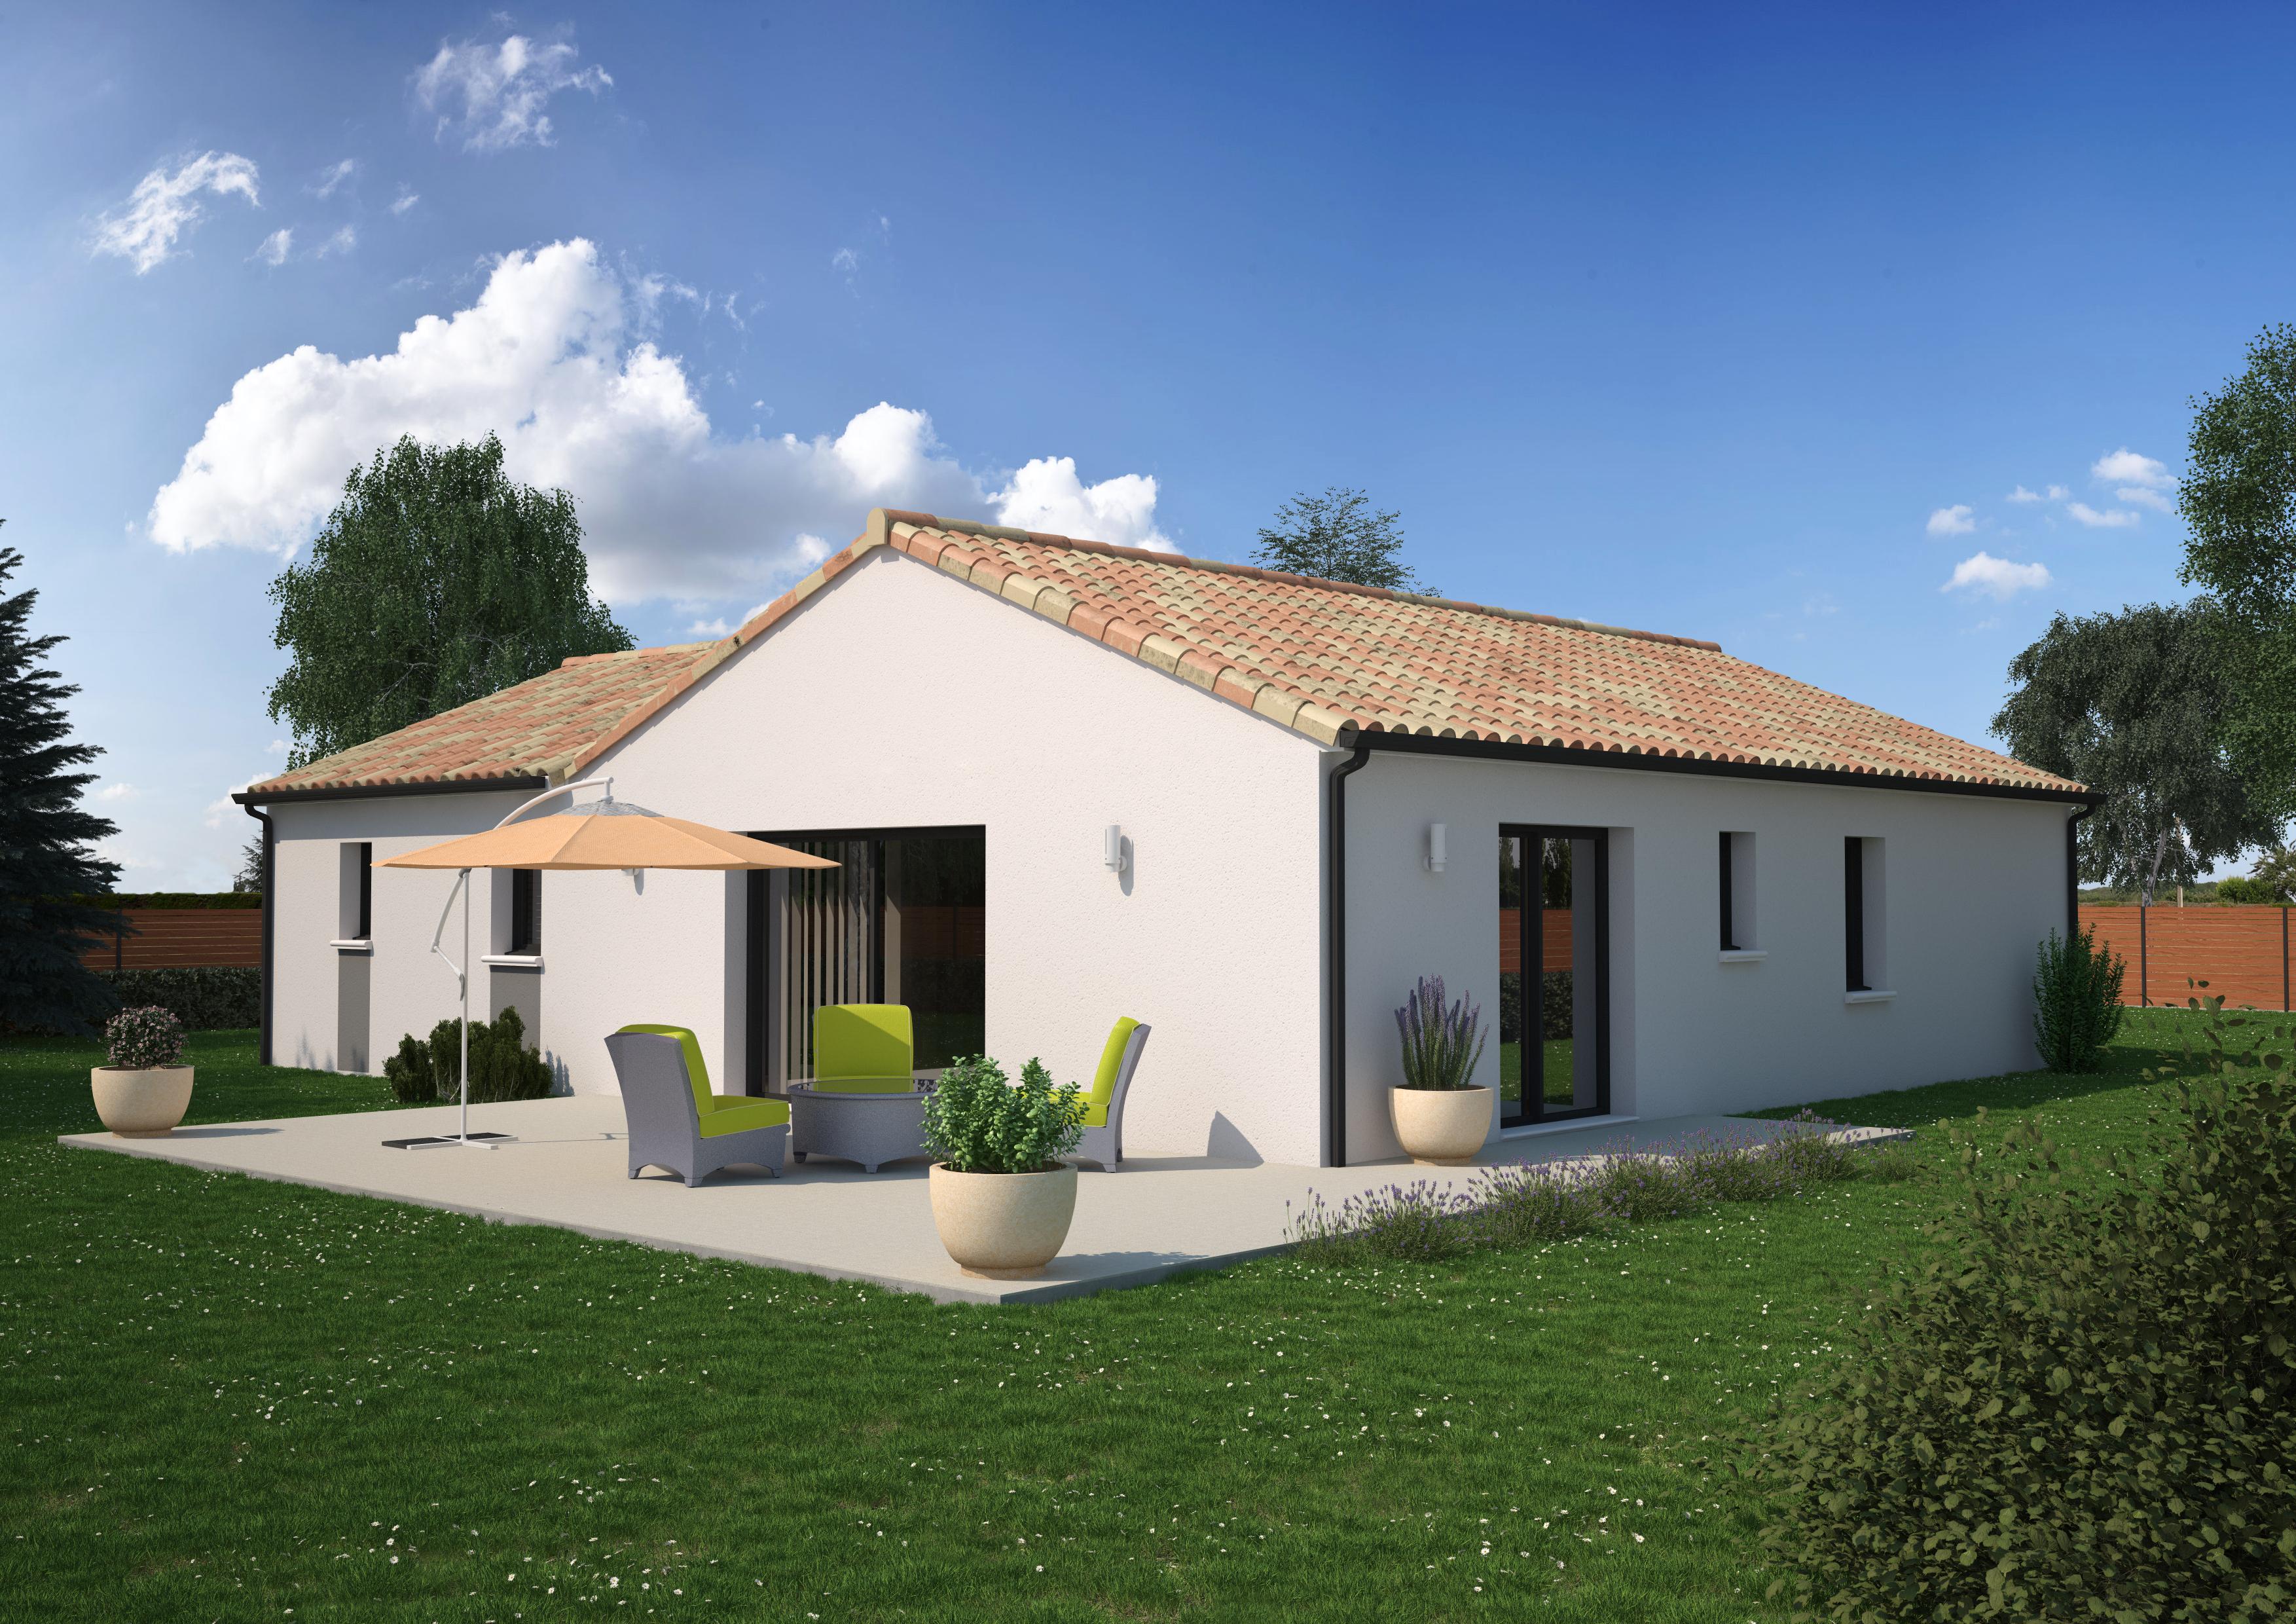 Maison à vendre à Chabournay